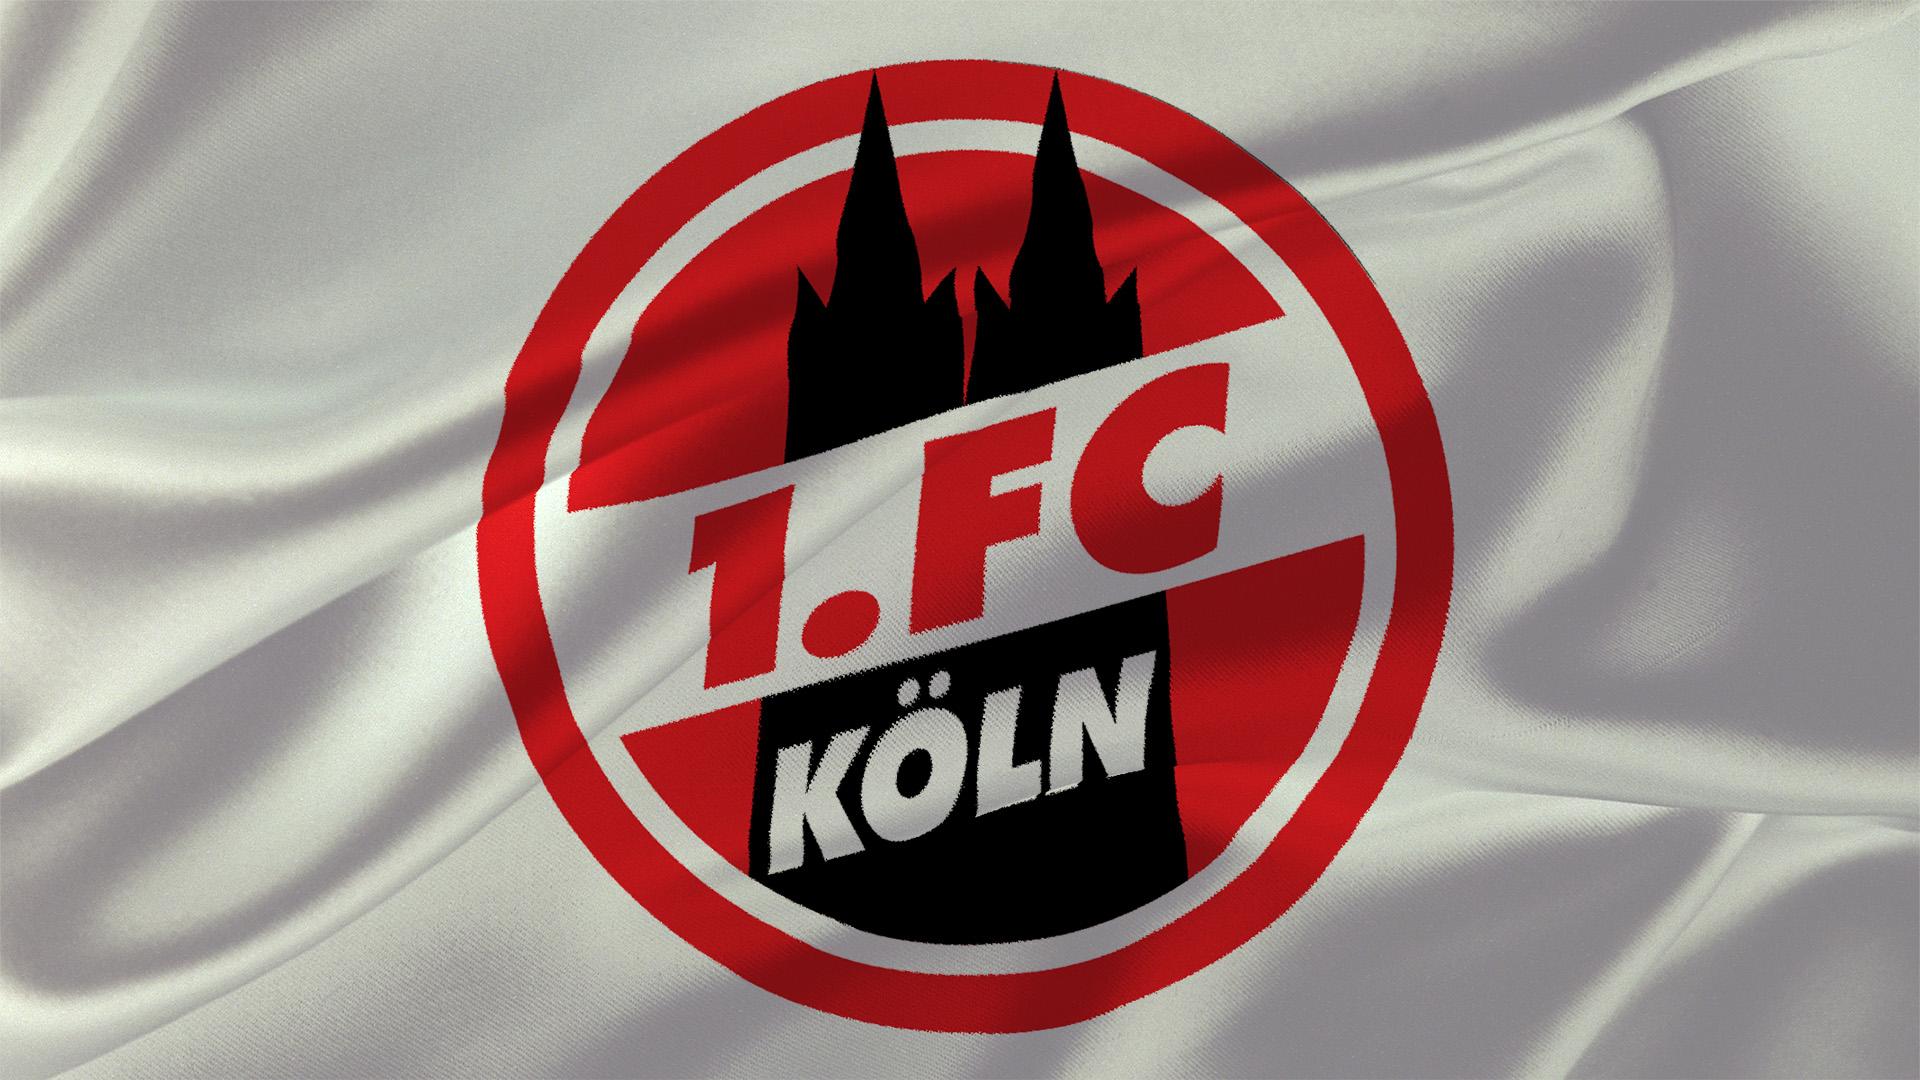 Fc Köln Bild.De